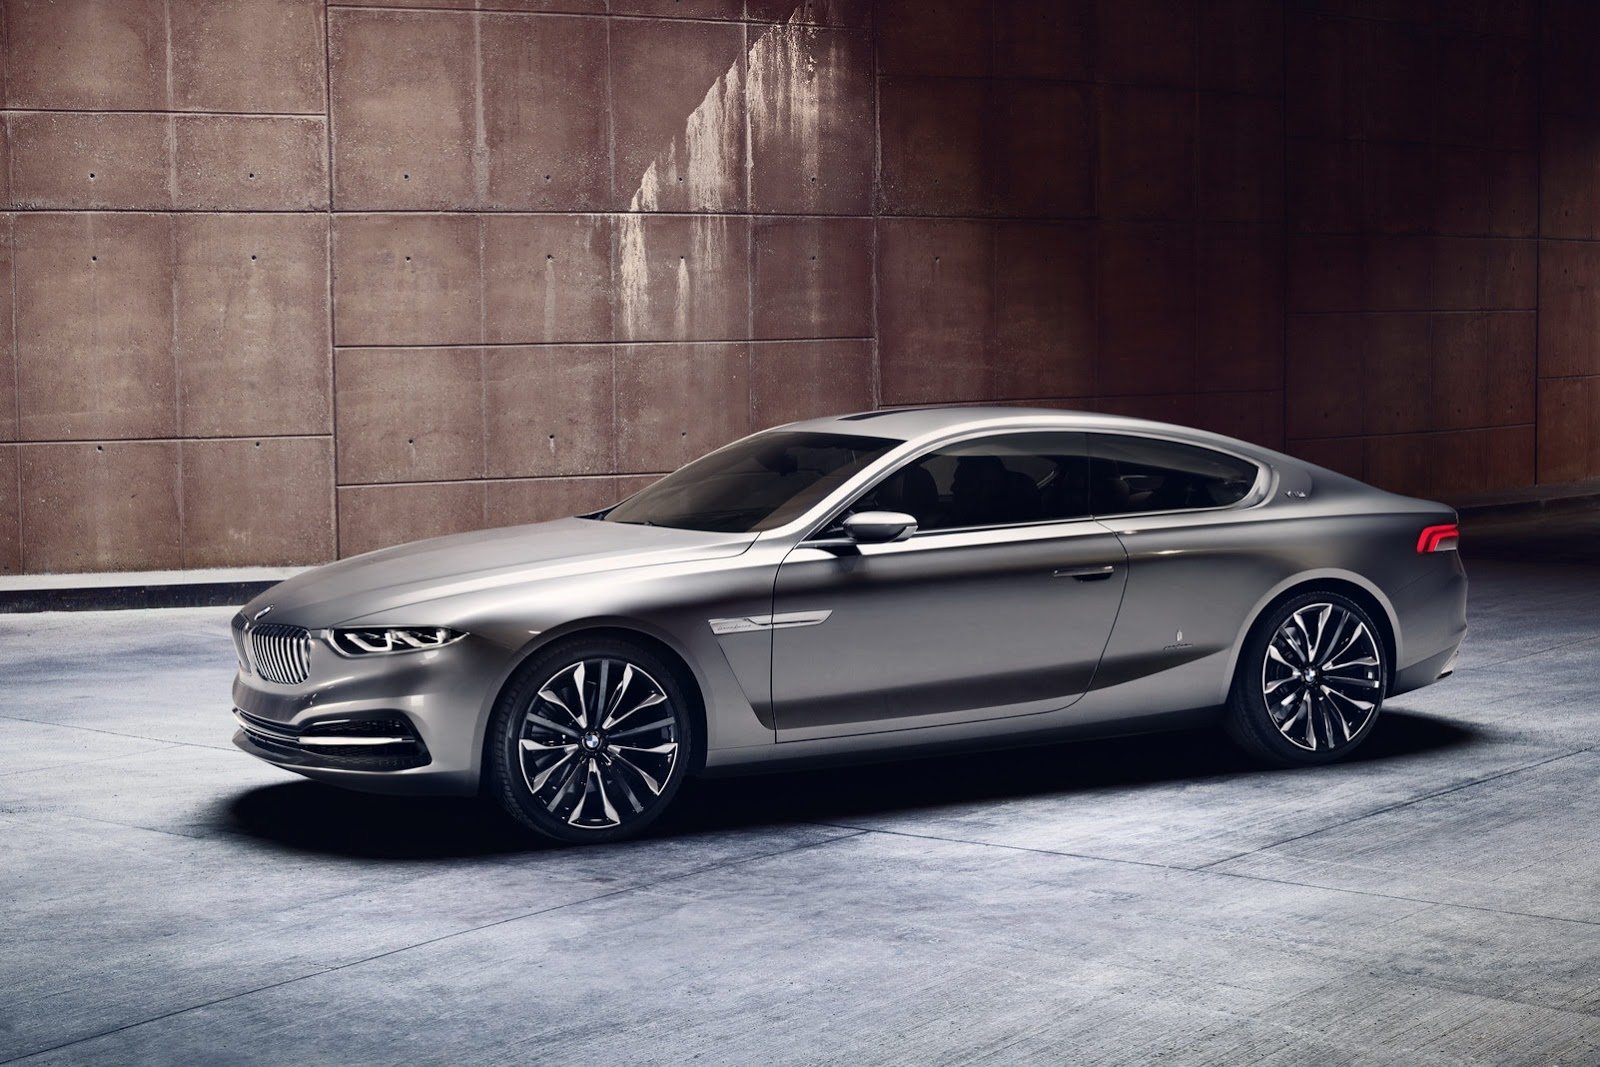 bmw 9 series luxury